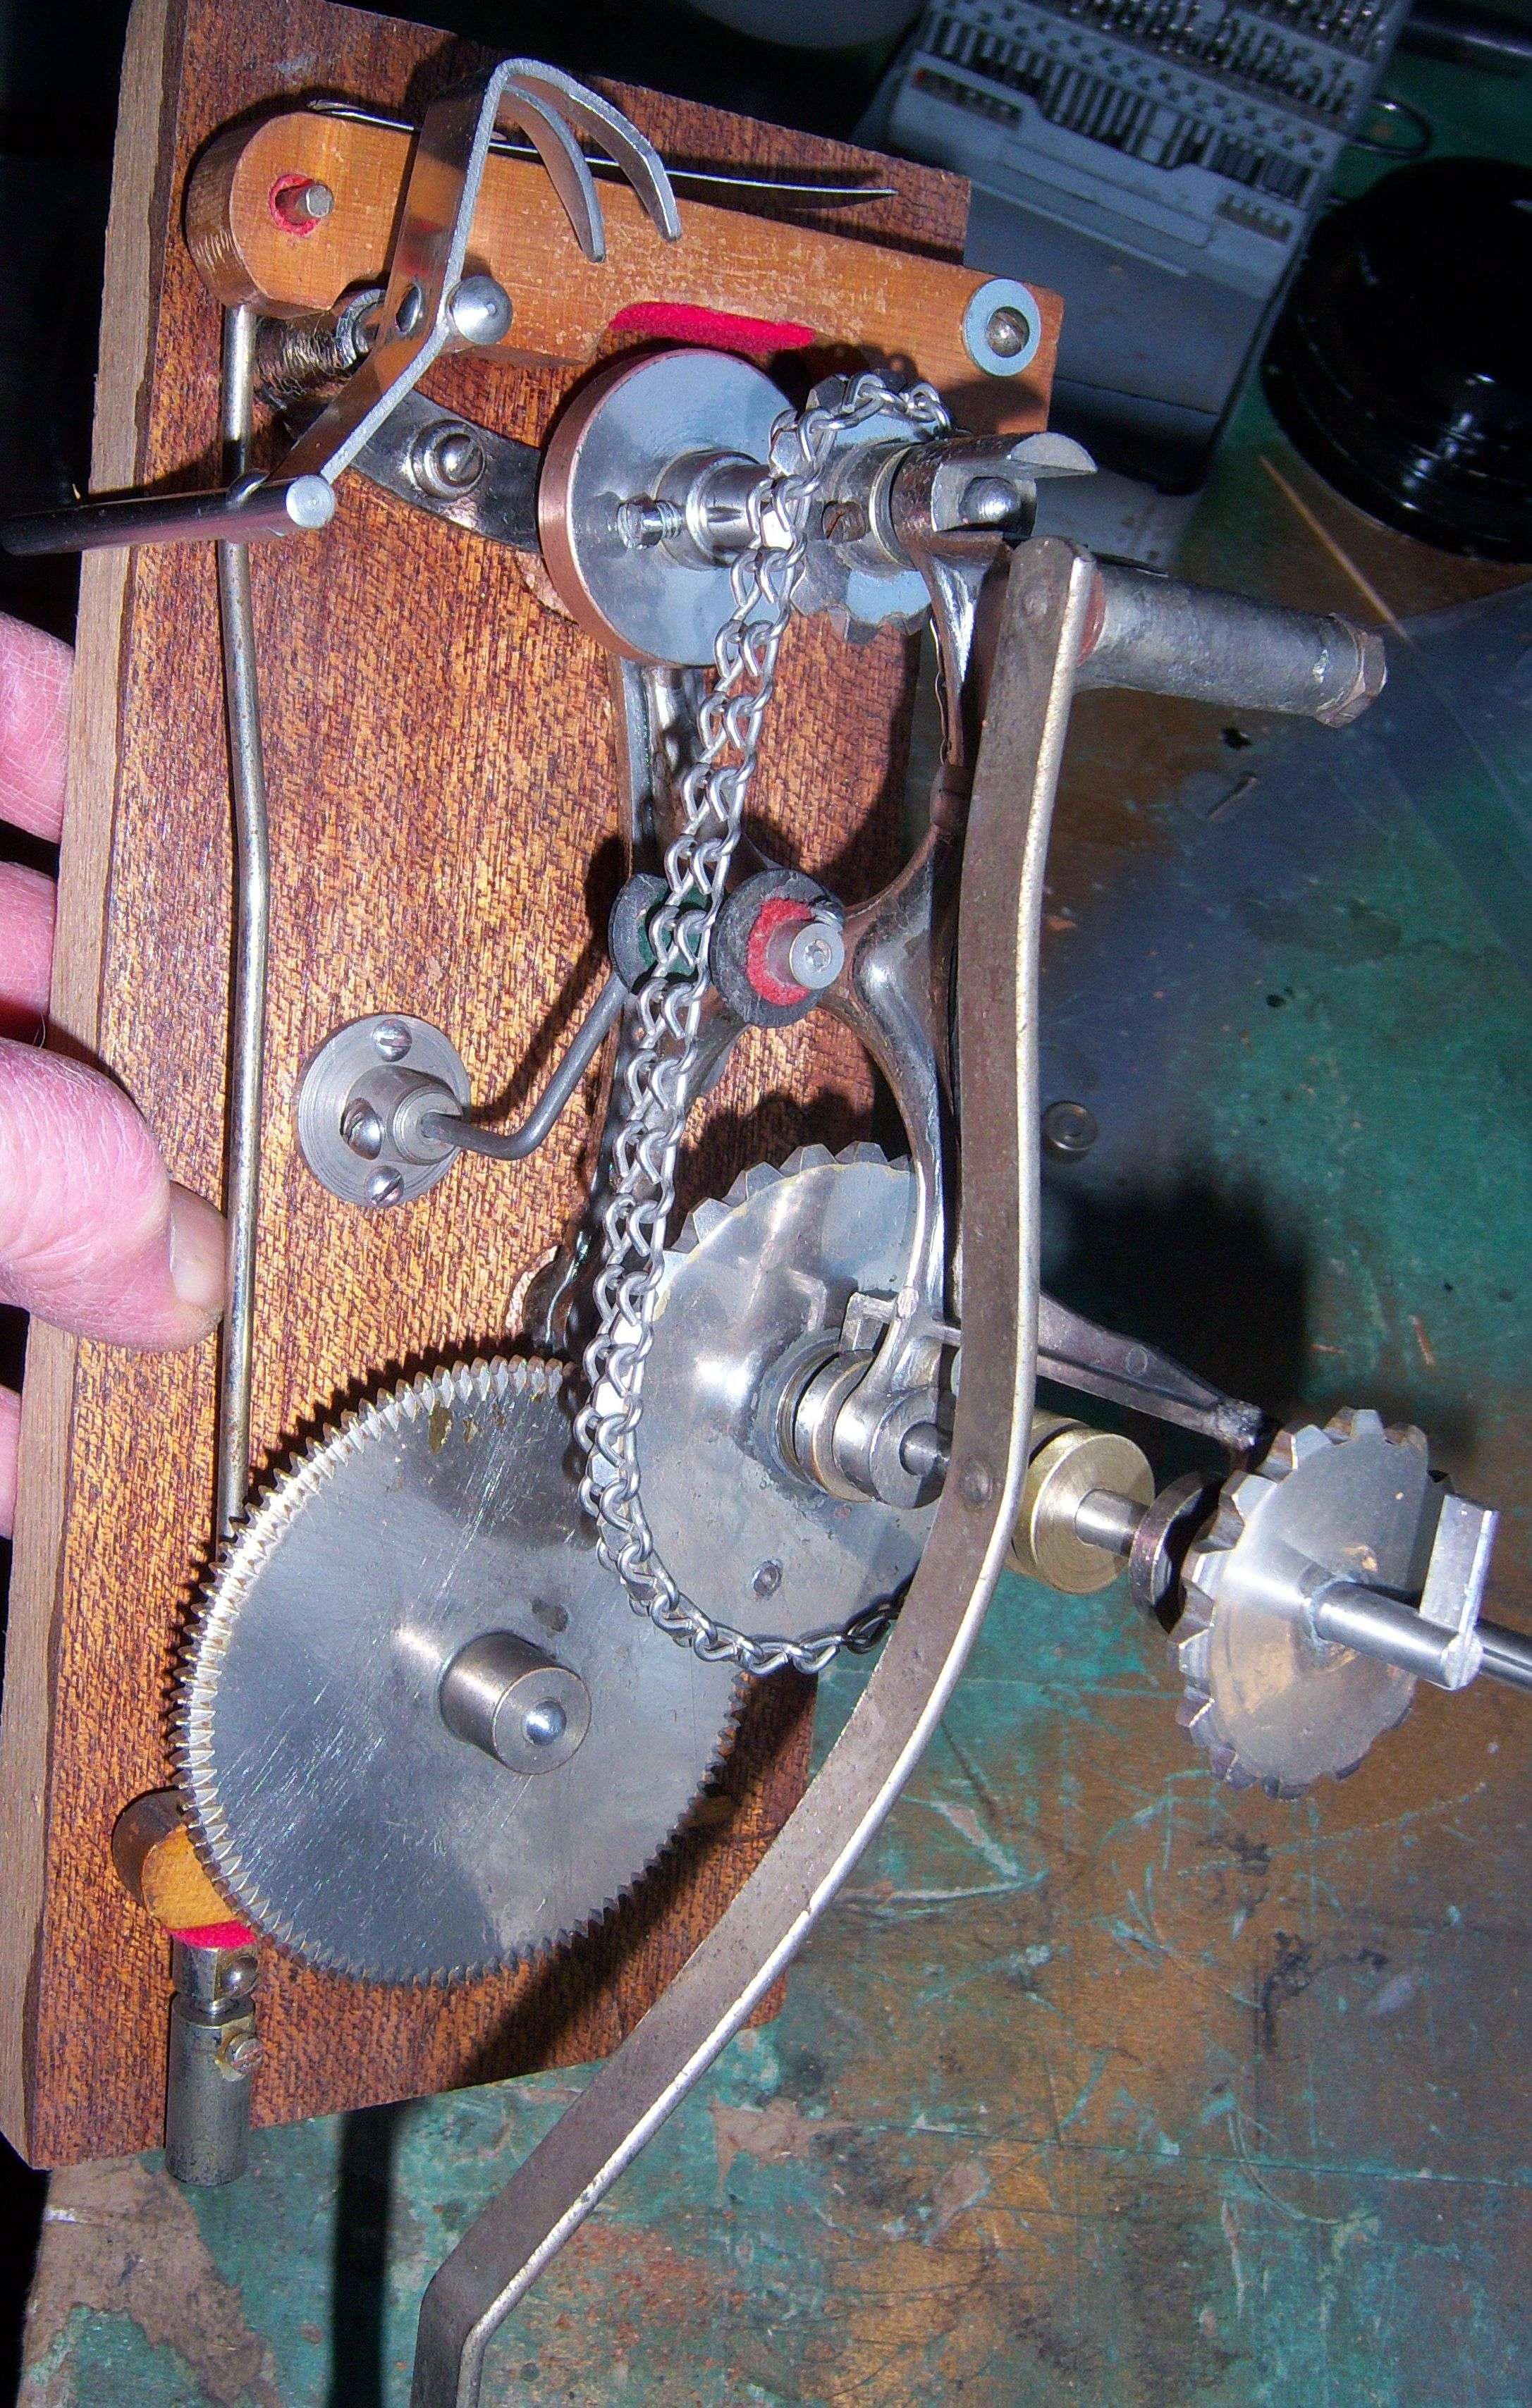 assembled transmission